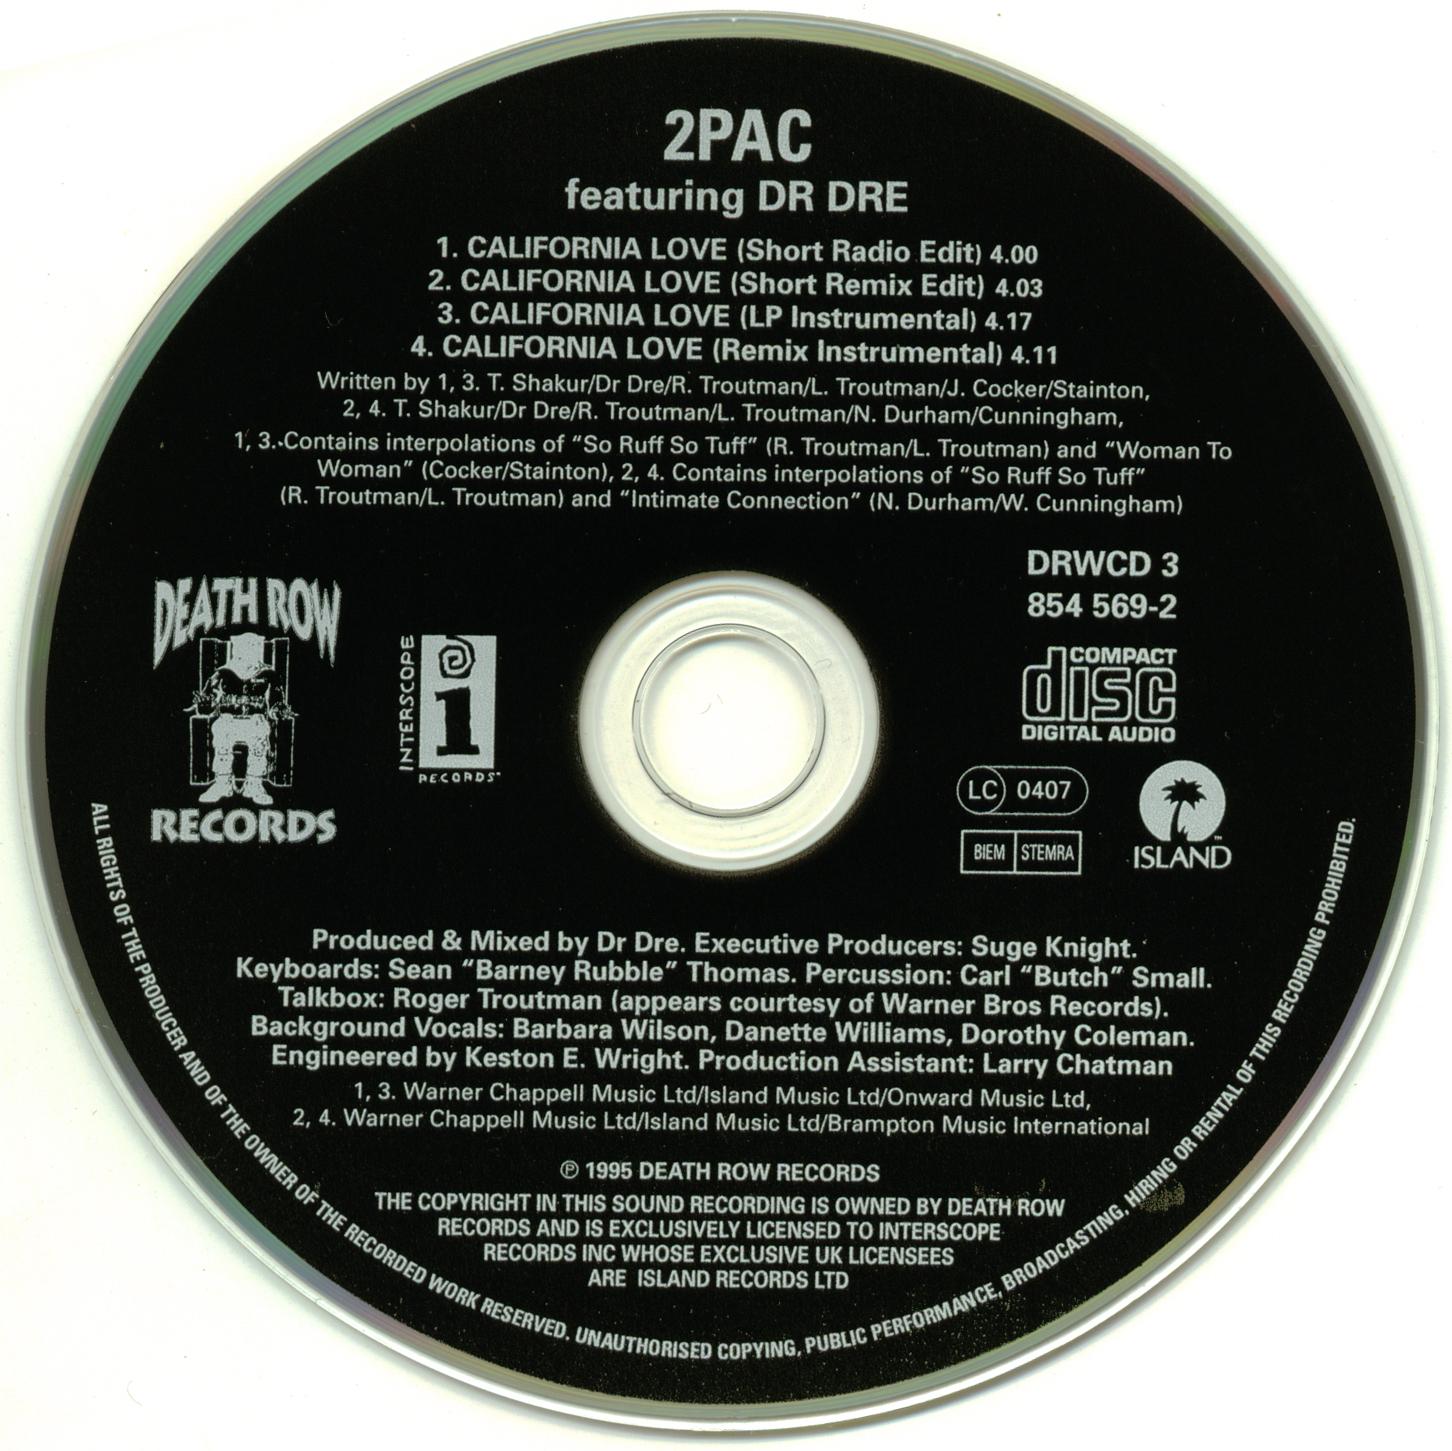 Яндексмузыке: 2pac, 2pac go ahead static is the last thing ya need when ya see me 2pac go ahead and rock, 2pac